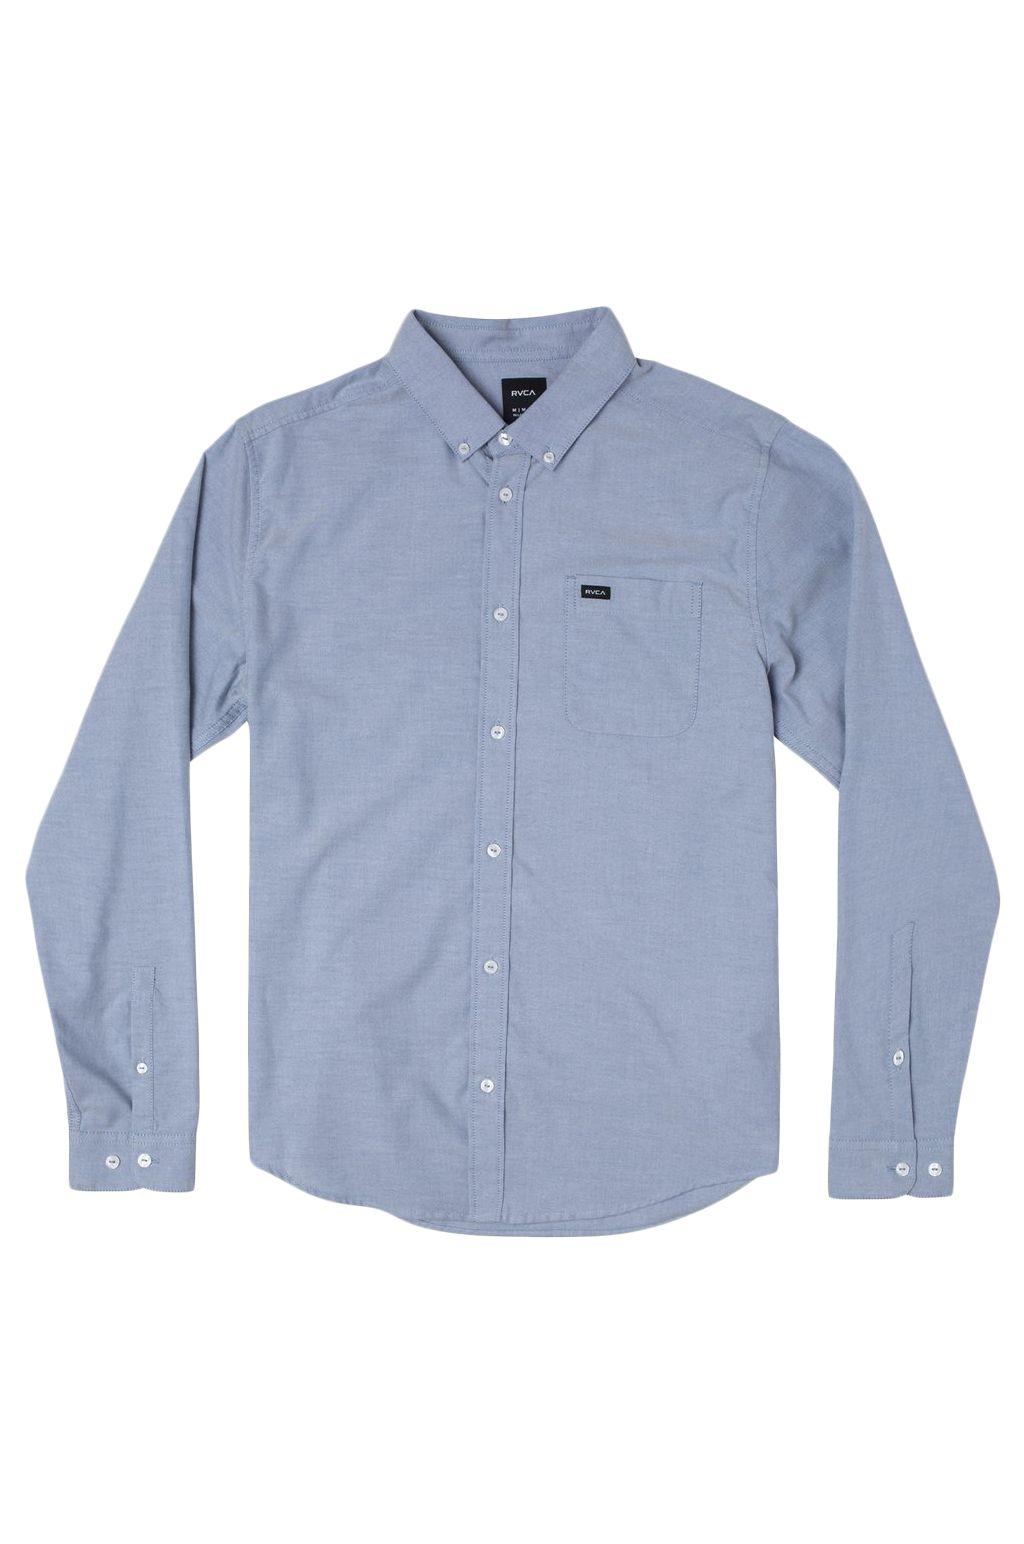 Camisa RVCA THATLL DO STRETCH LS Distant Blue